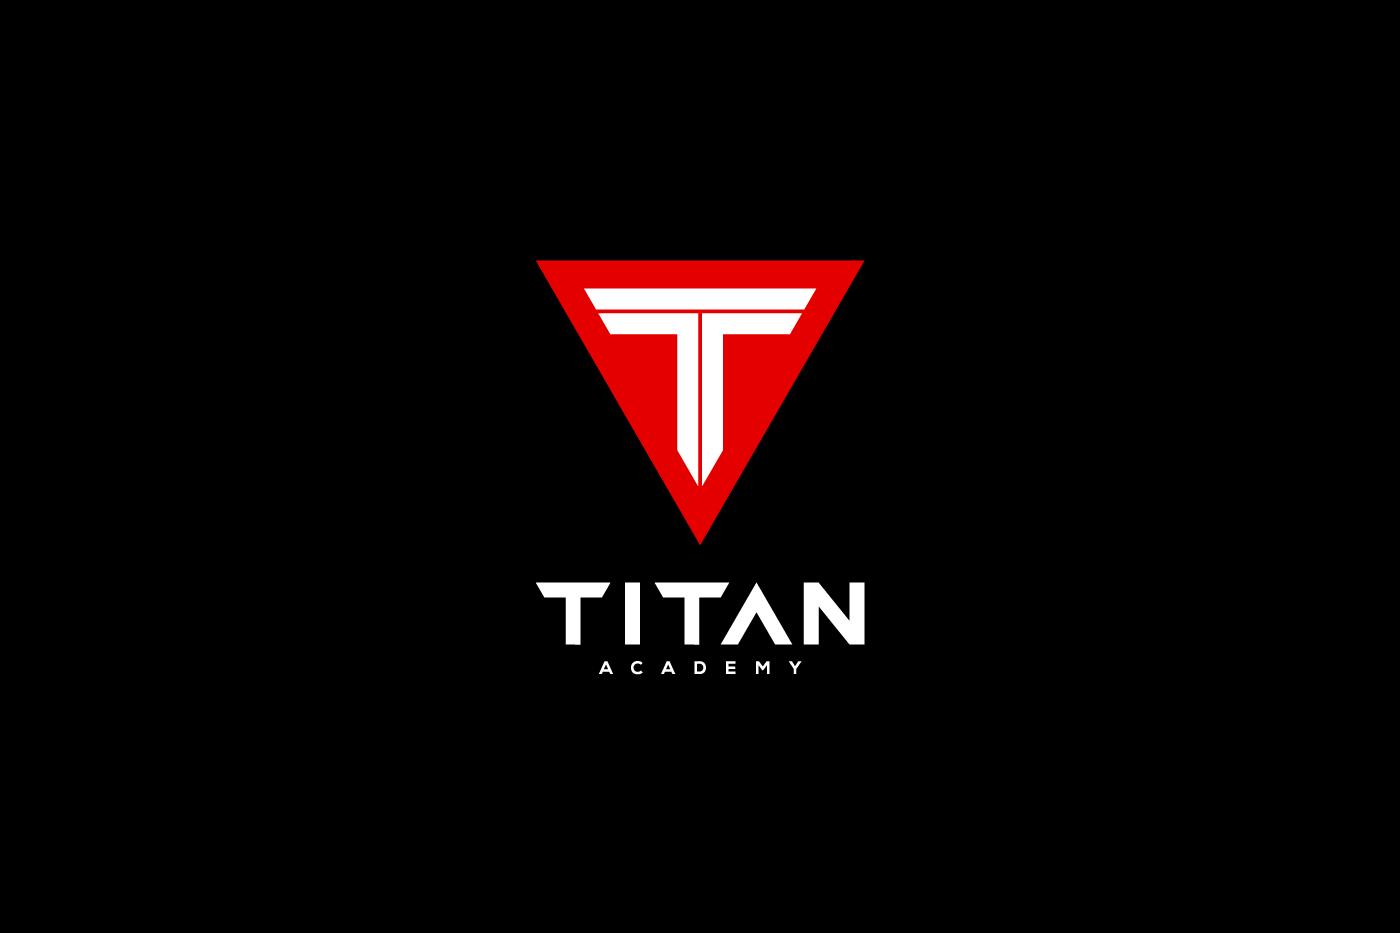 titan-academy-logo.png